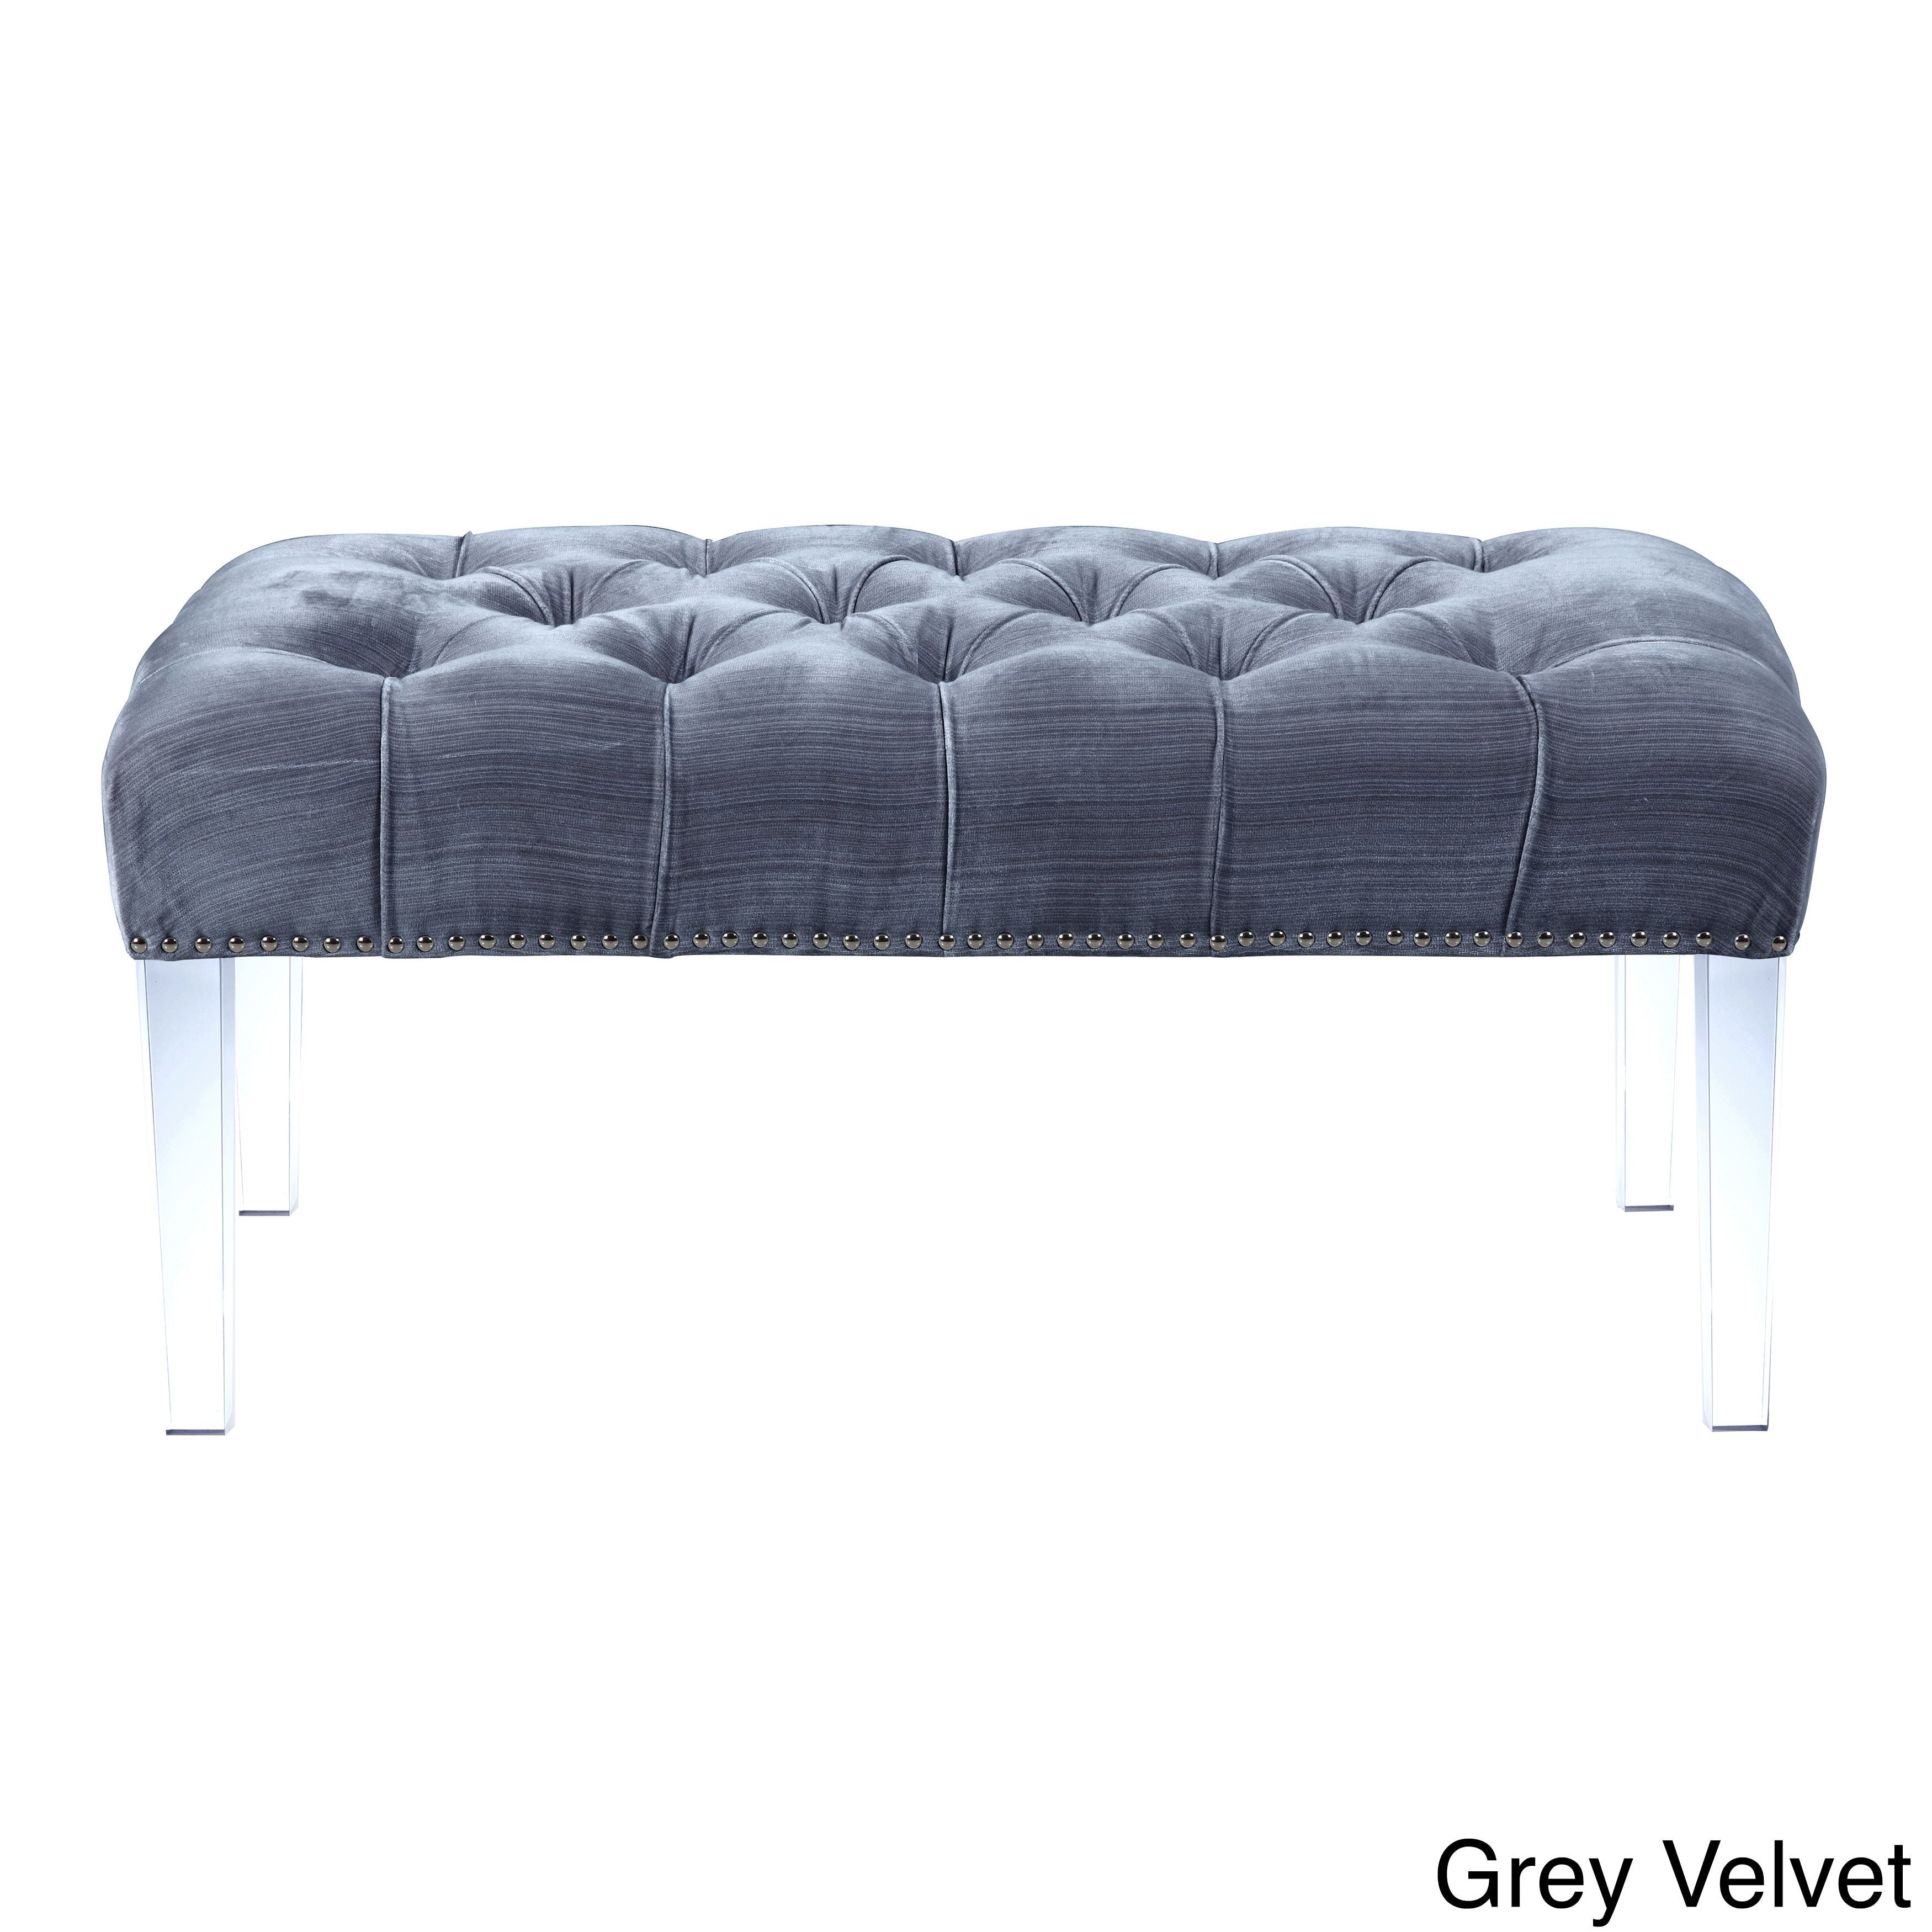 Strange Chic Home Odette Button Tufted Nailhead Ottoman Bench Grey Theyellowbook Wood Chair Design Ideas Theyellowbookinfo